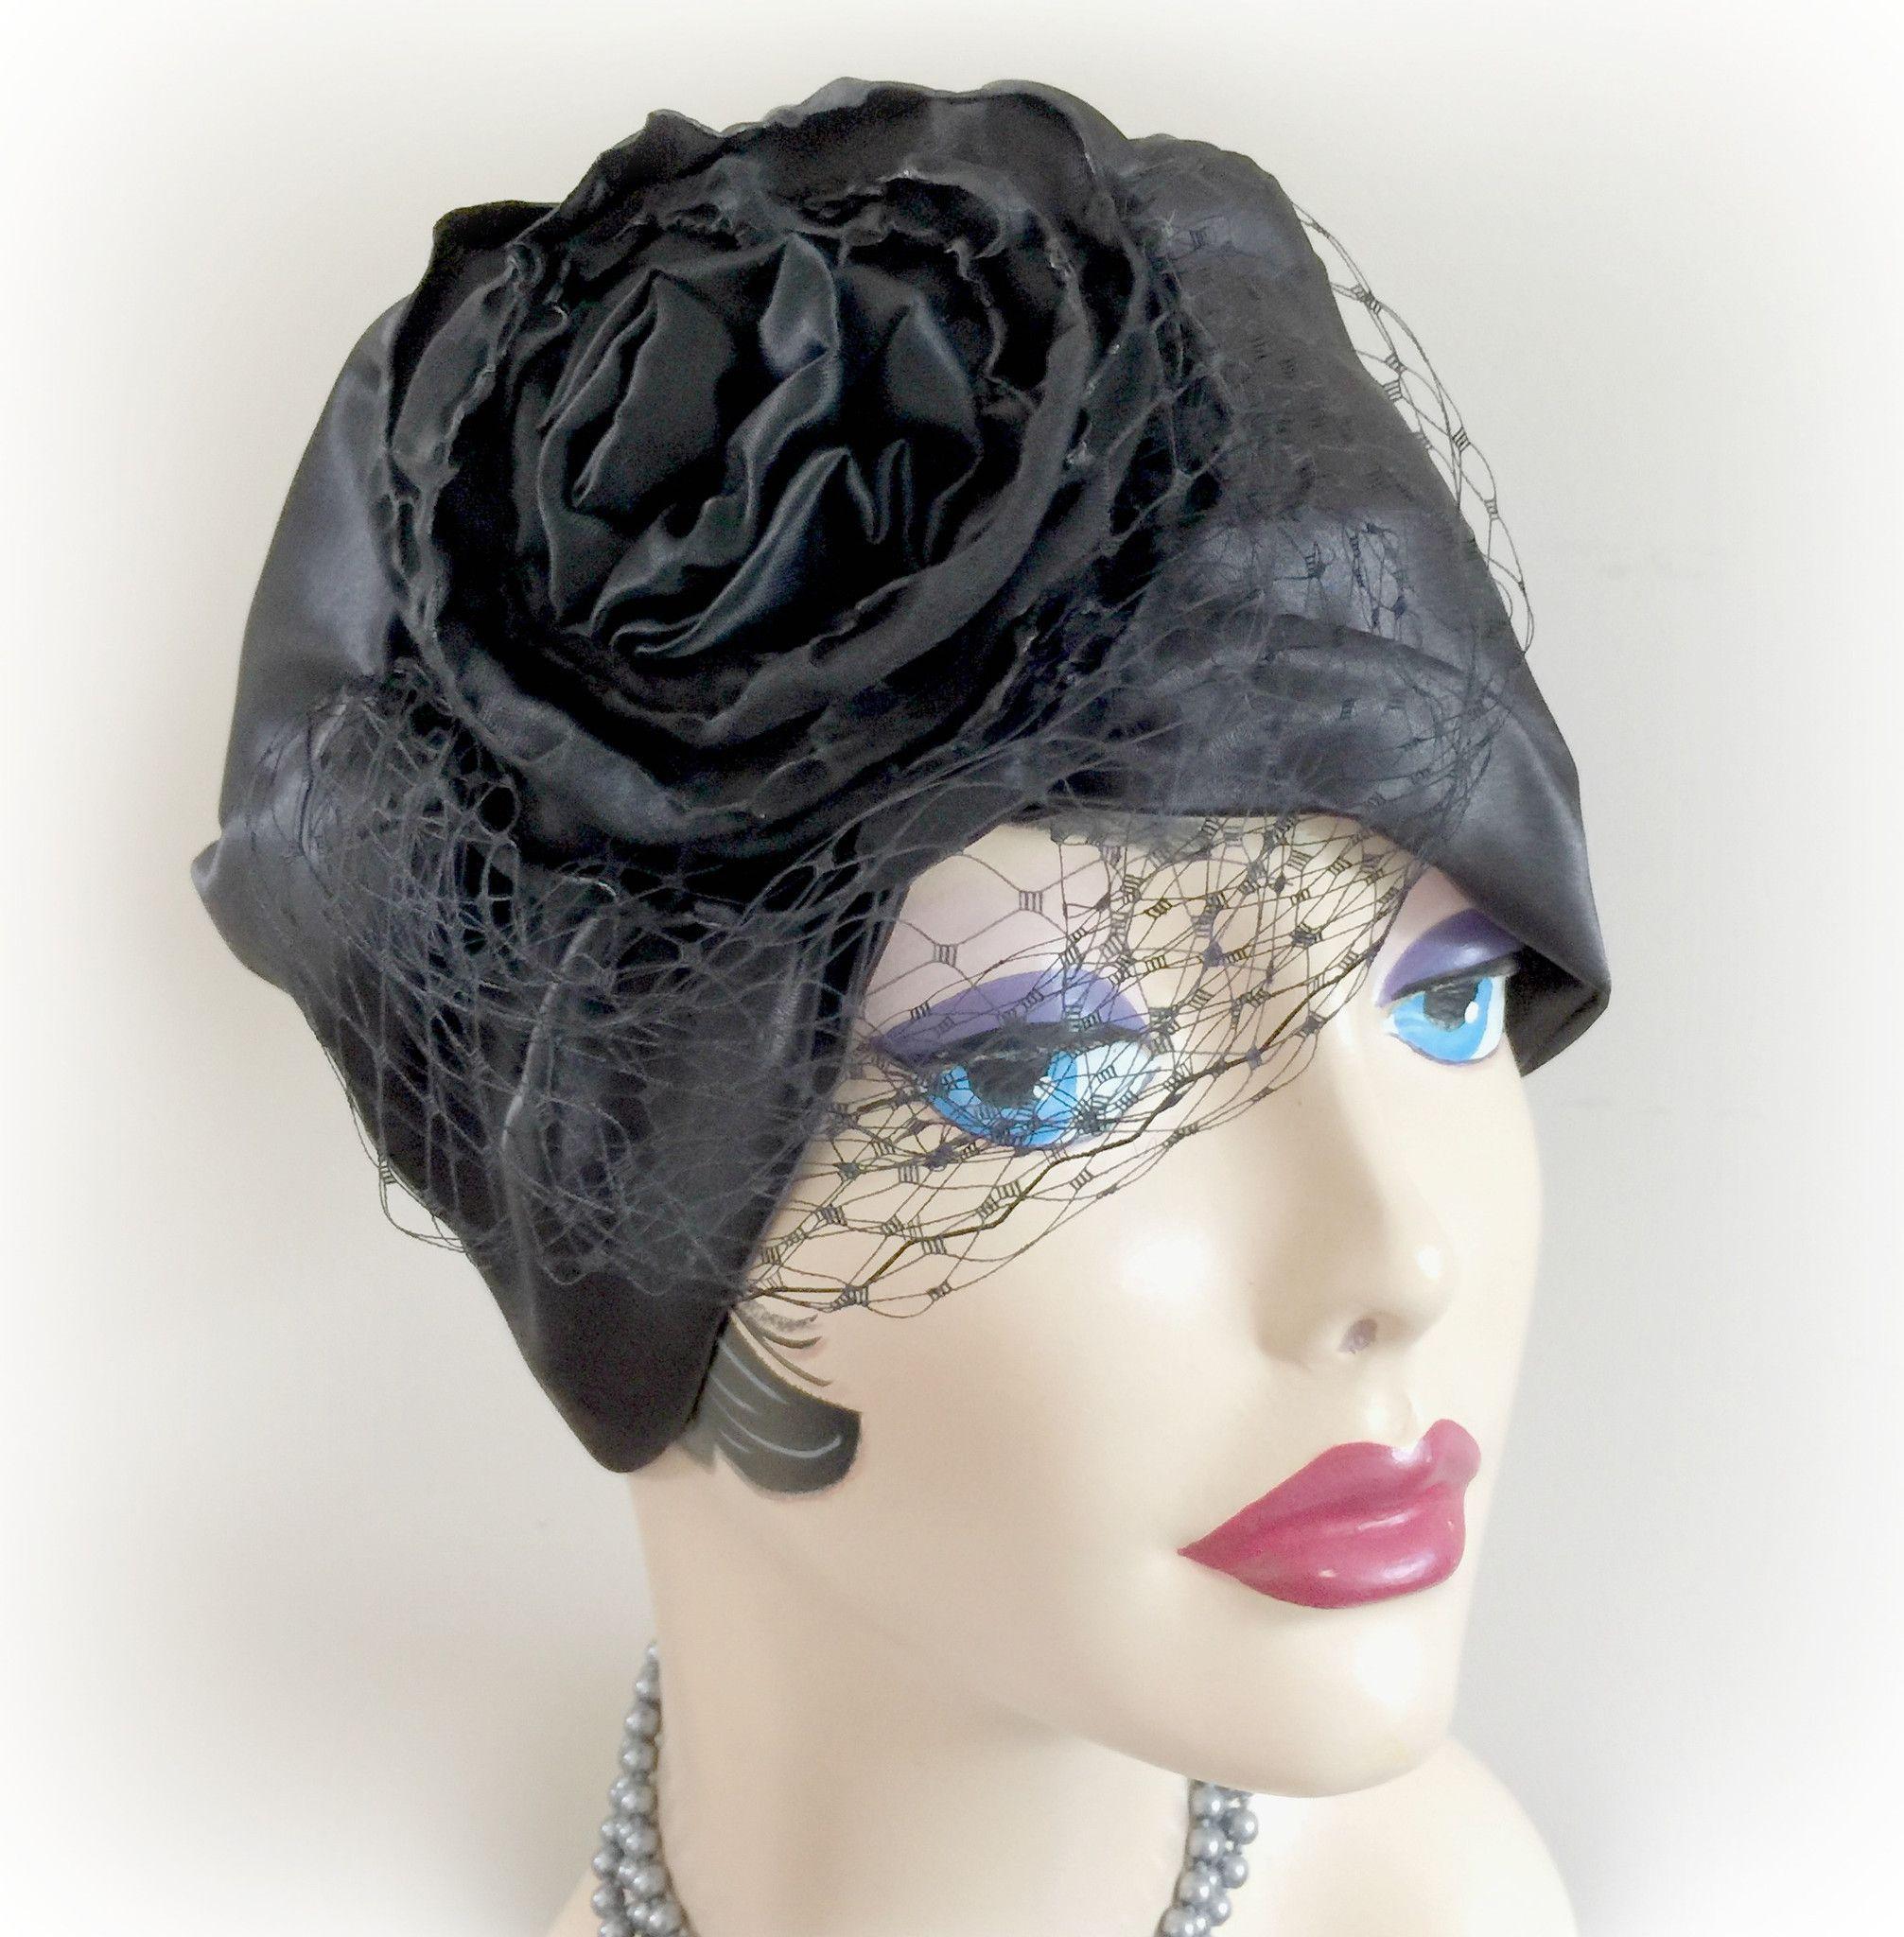 Black Satin Turban Black Satin Fascinator Birdcage Fascinator Evie Flapper  Style Cloche Women s Vintage Hat 1920 s Hats Elegant Hat Handmade USA 4329c9a96ea